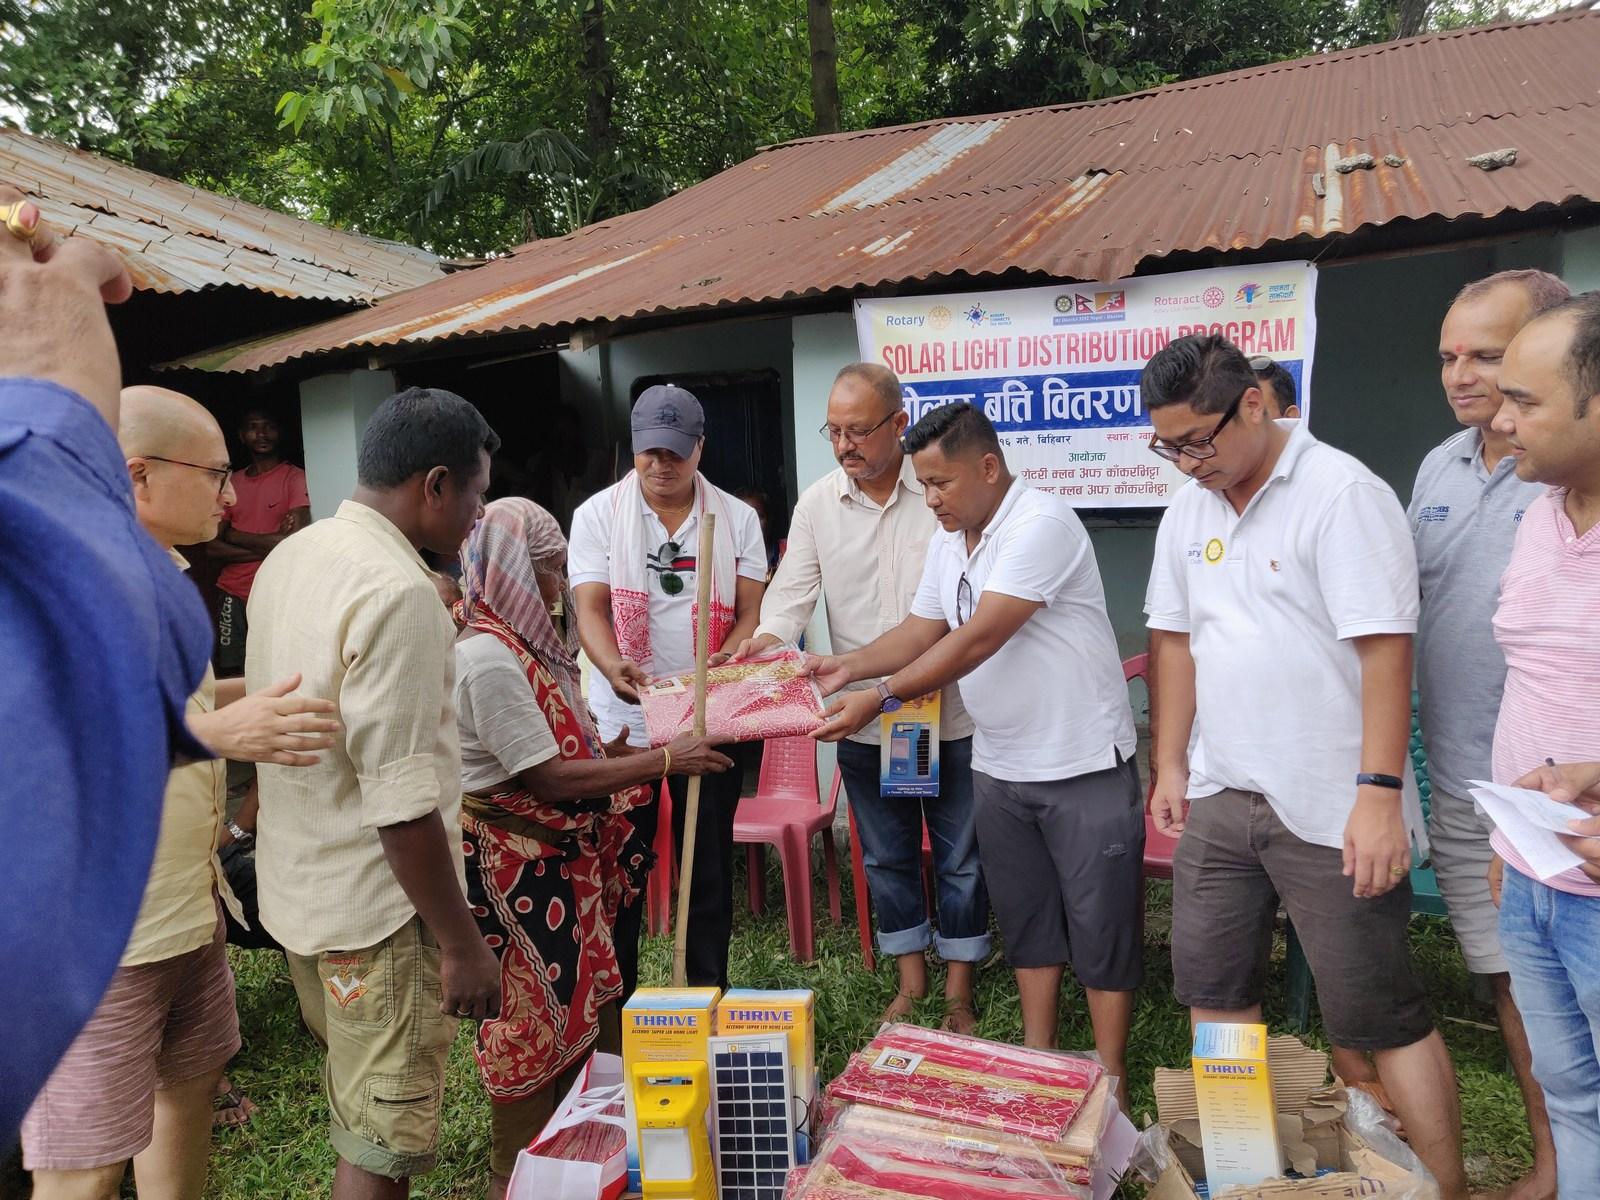 Solar-Light-Distribution-Program-Rotary-Club-of-Kakarvitta-28